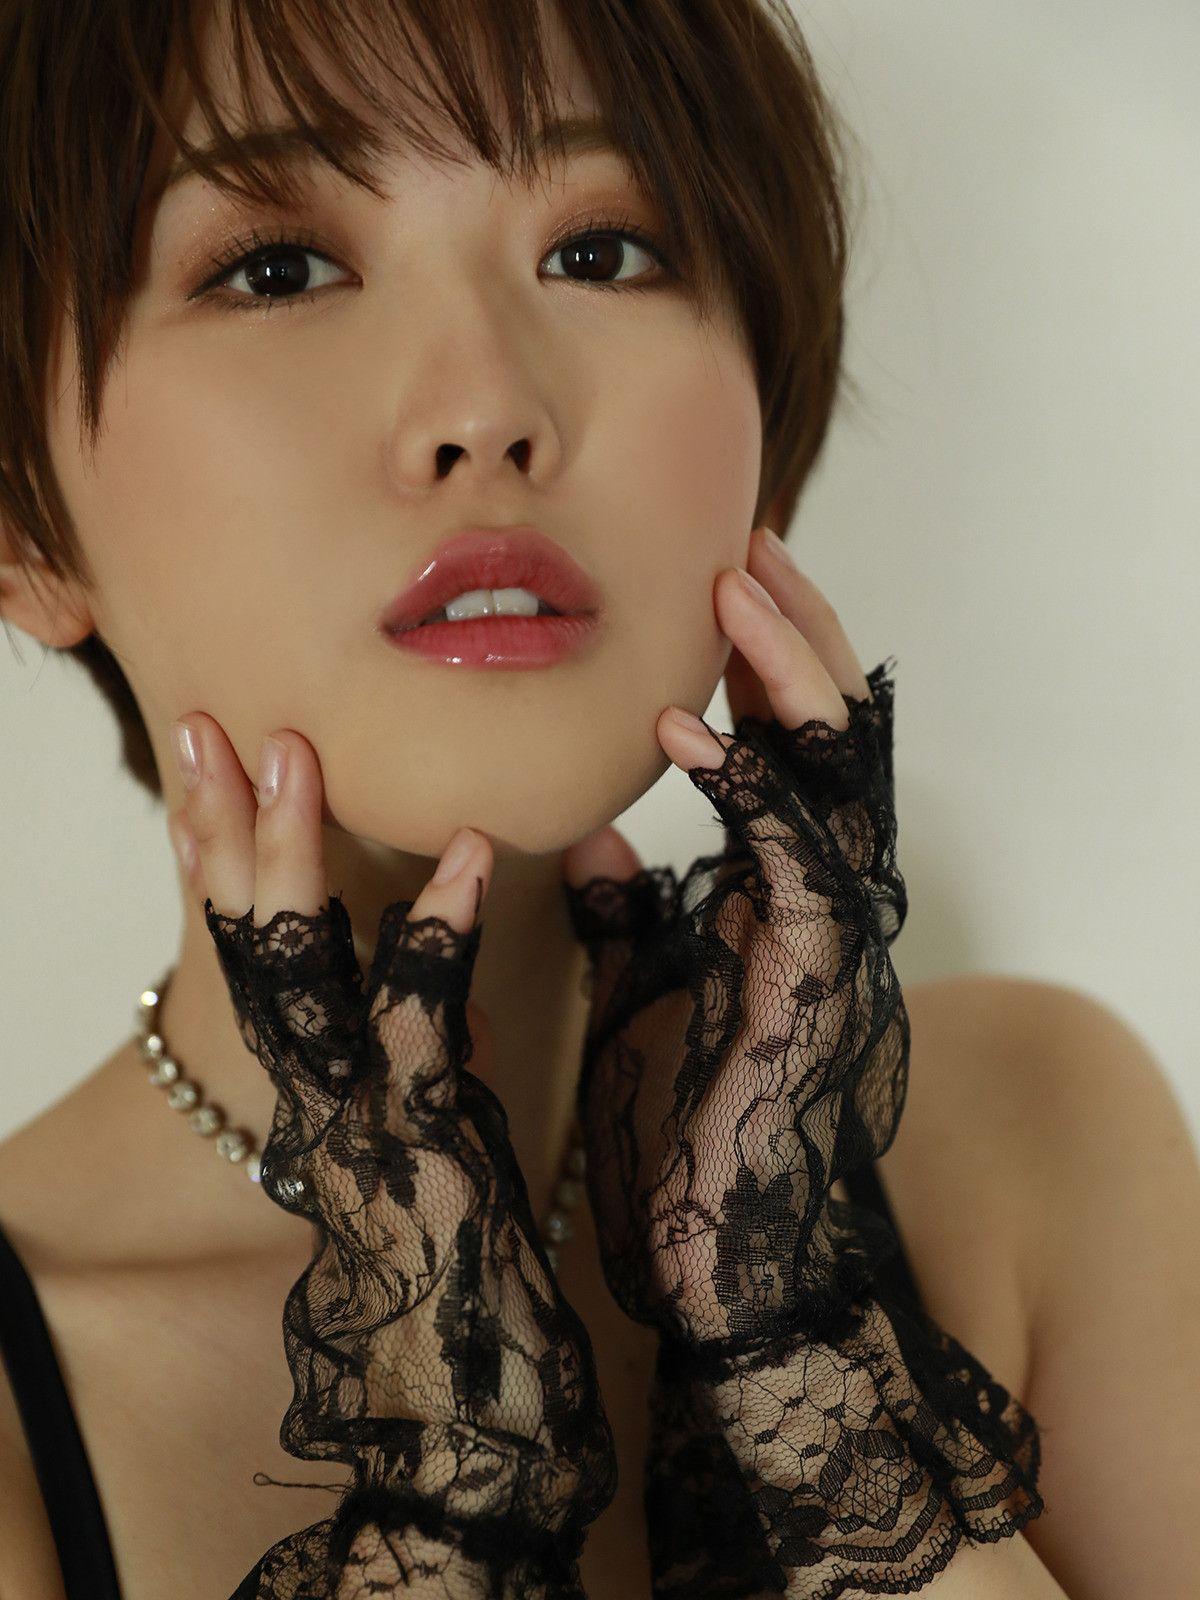 Asian Babes DB » Busty Schoolgirl Asian